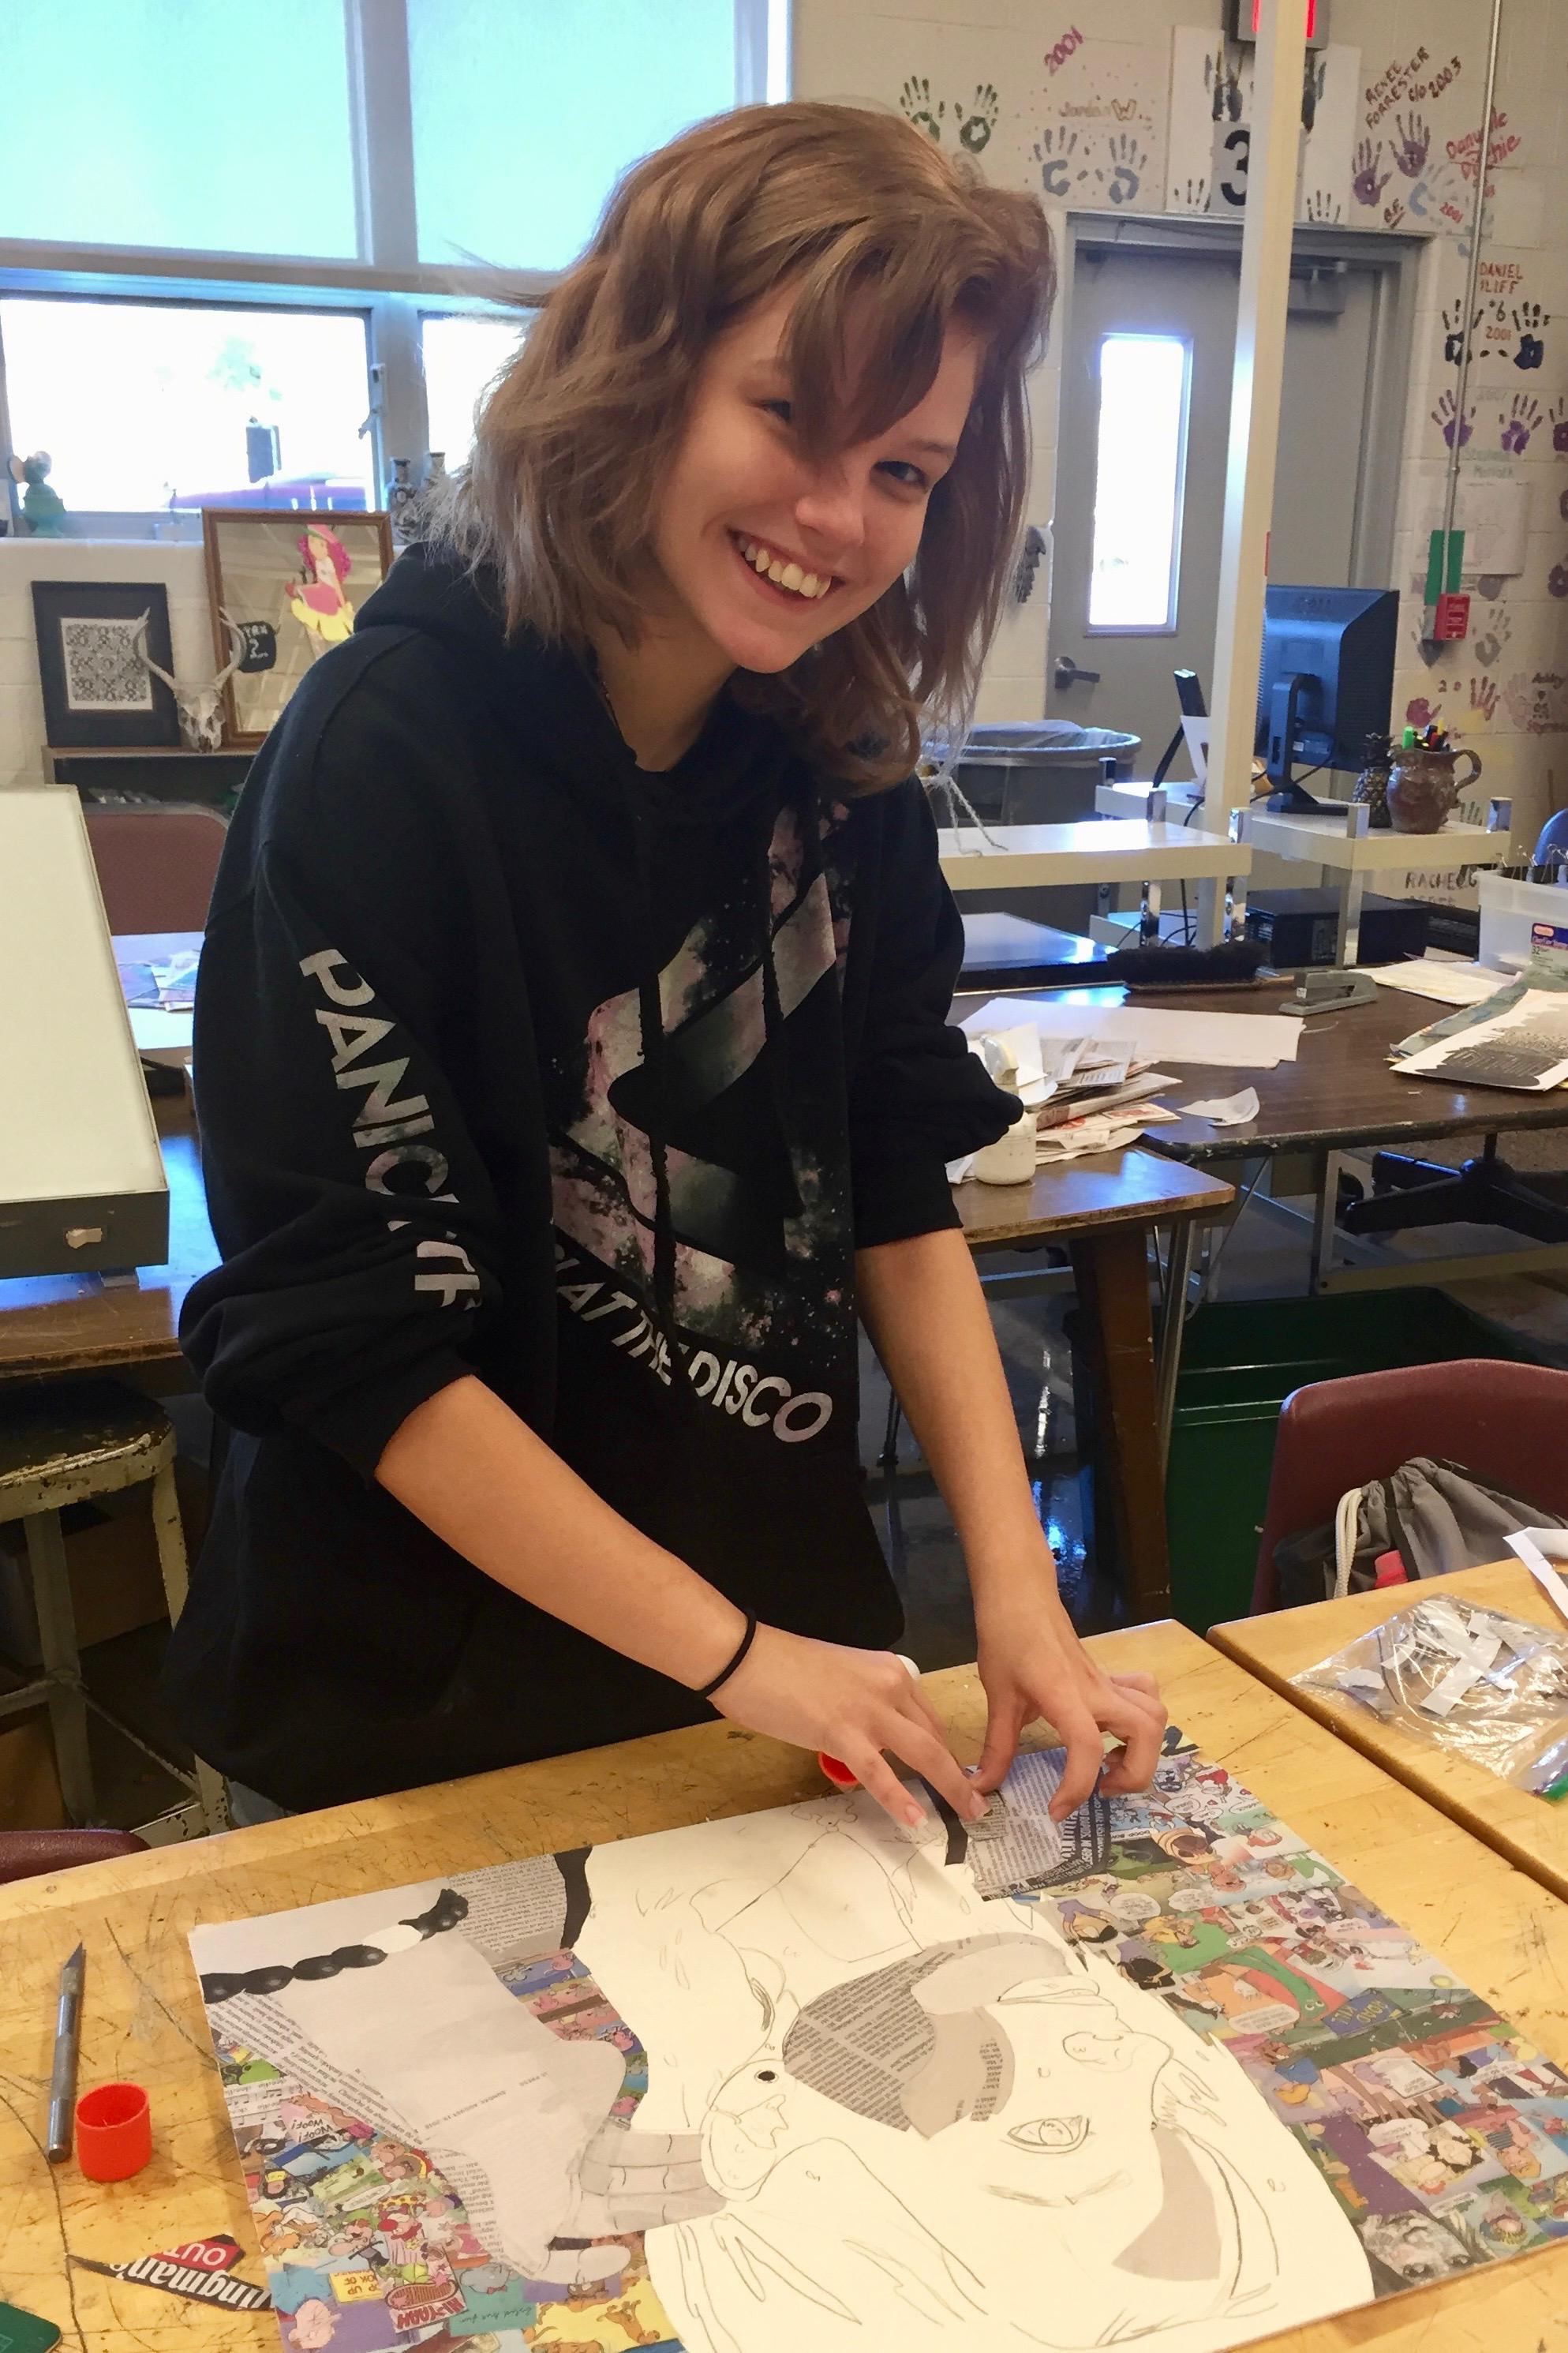 Maria Privett making her project